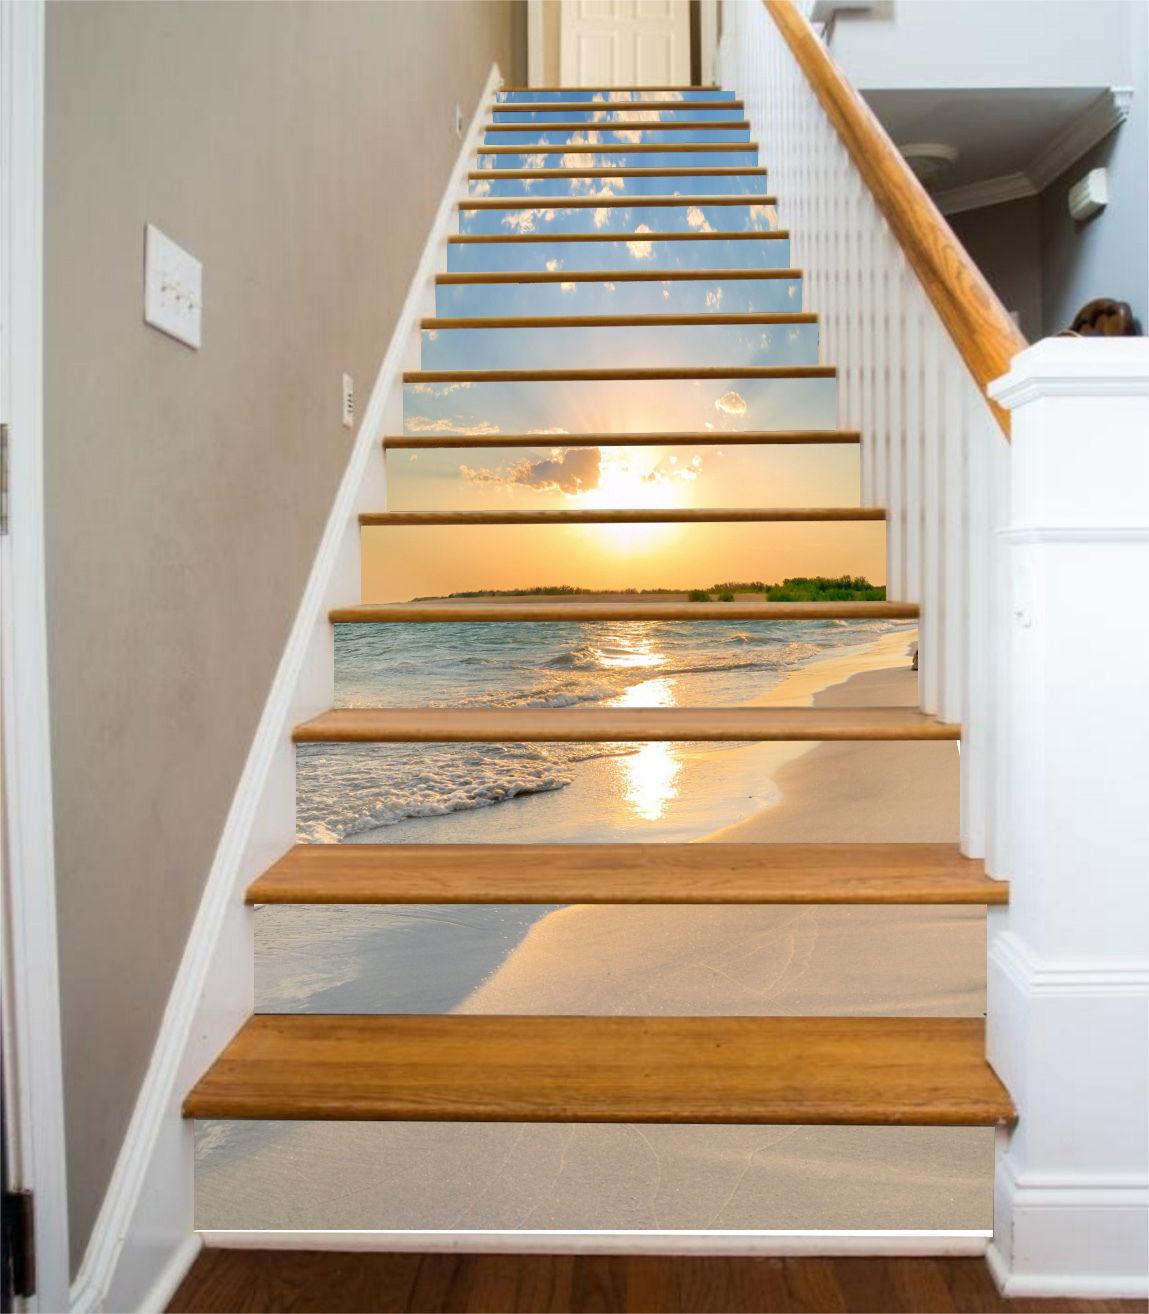 3D Sunny Beach 3551 Stair Risers Decoration Photo Mural Vinyl Decal WandPapier AU